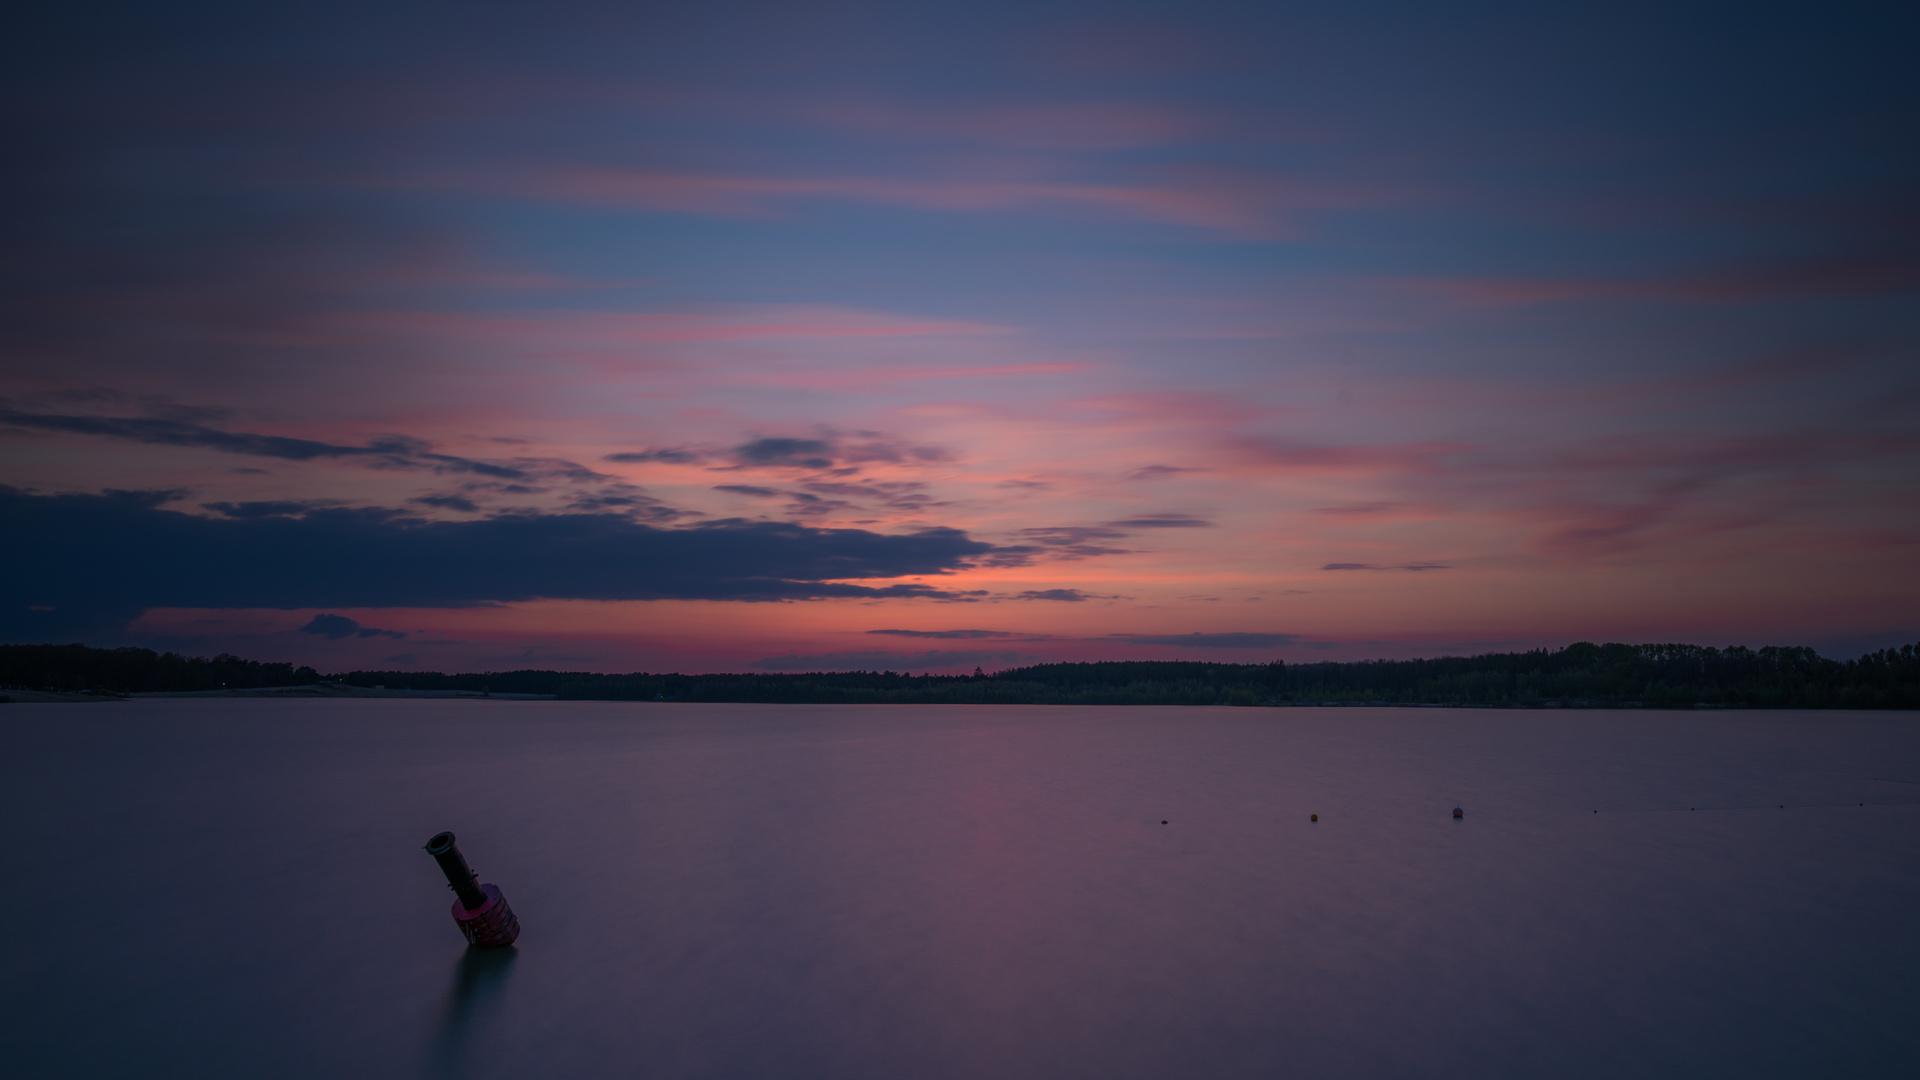 Sonnenuntergang am Silbersee